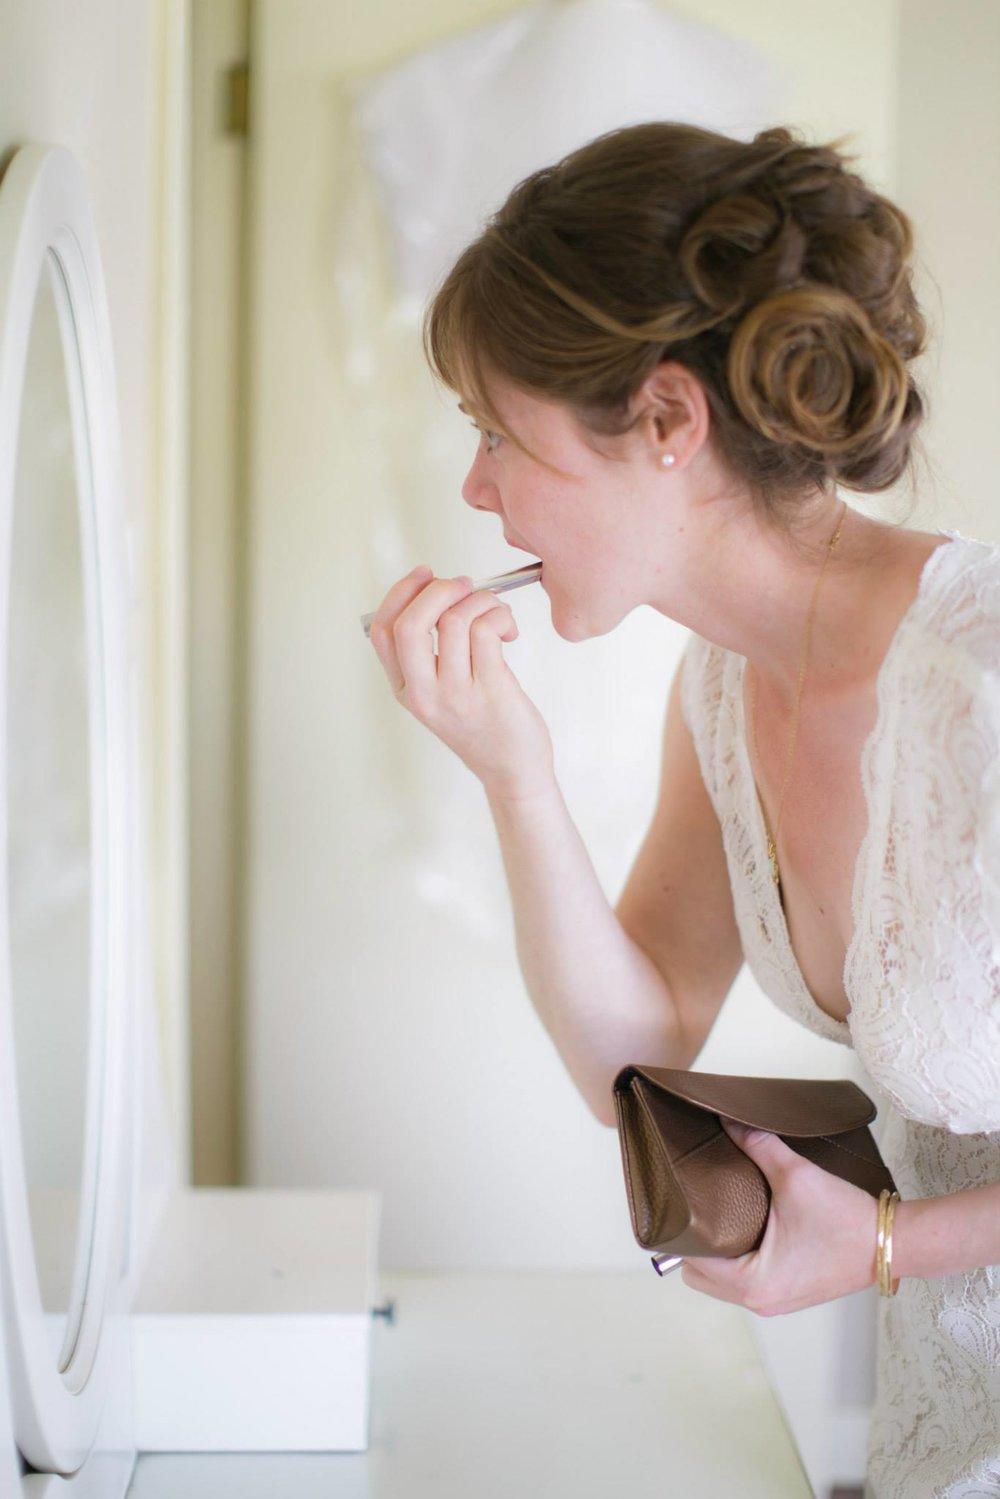 Bride Putting Lipstick On.jpg